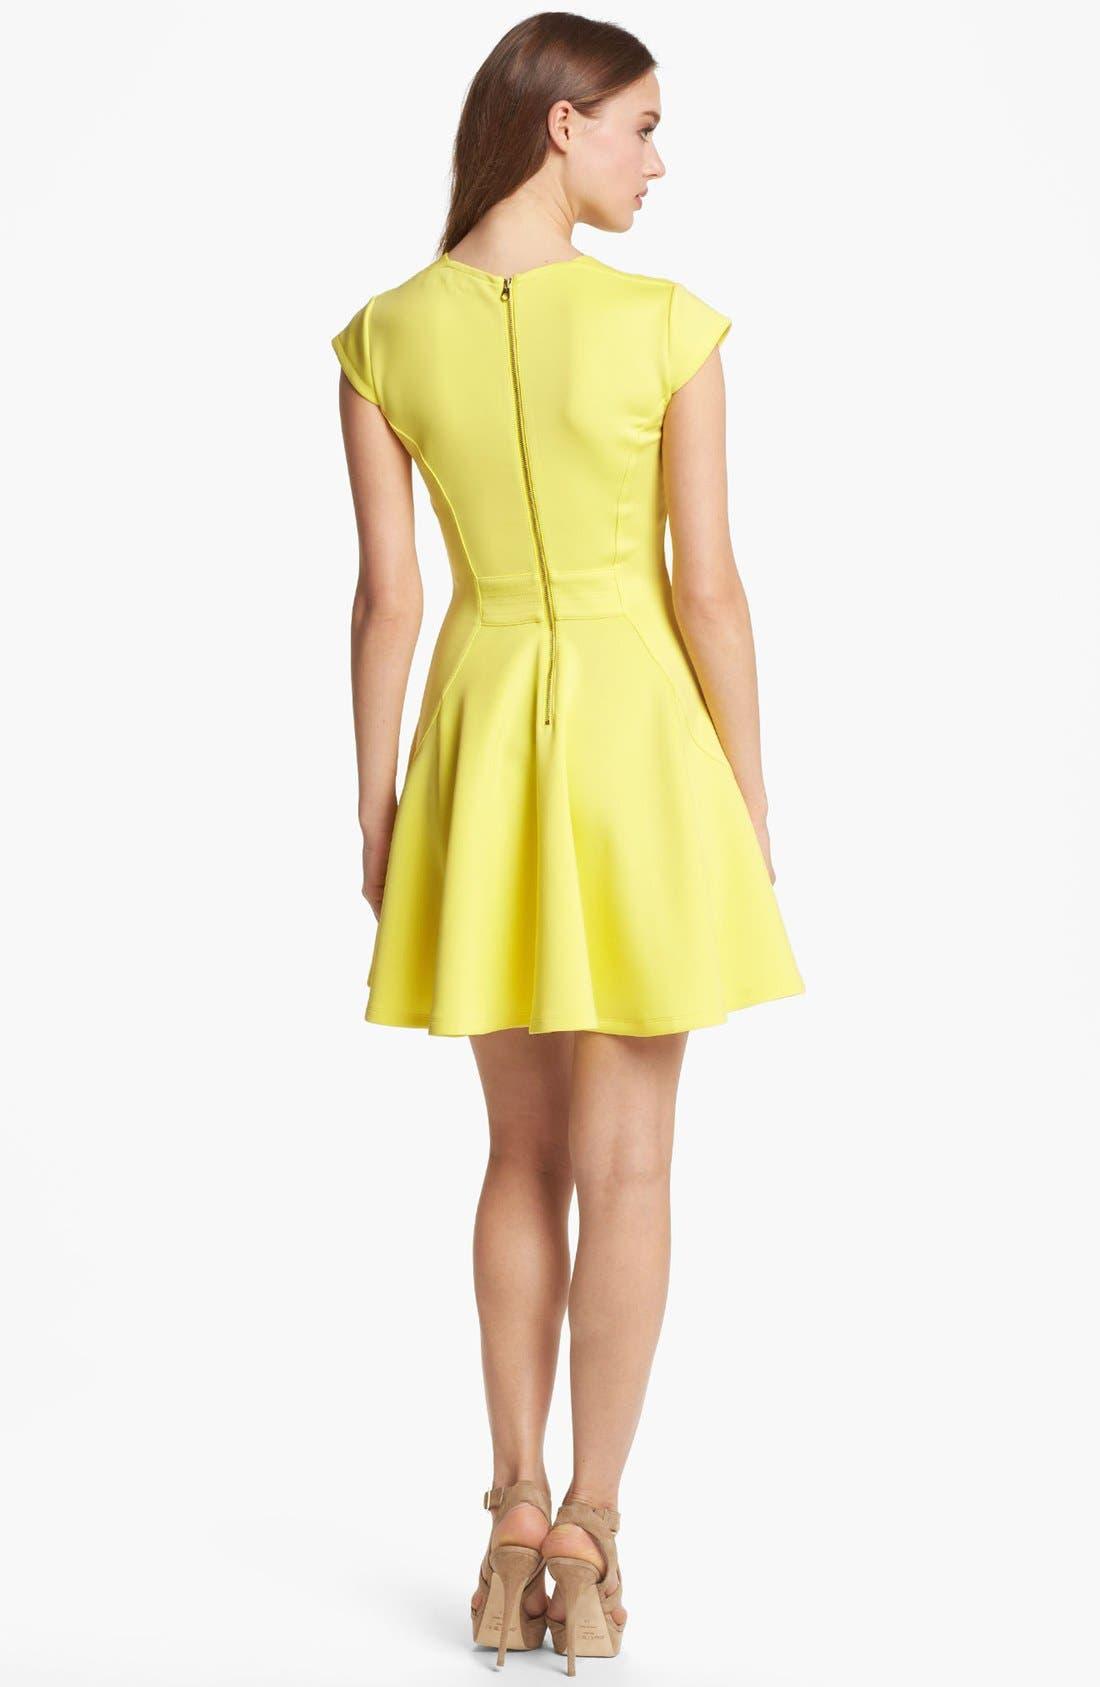 Alternate Image 2  - Ted Baker London Stretch Fit & Flare Dress